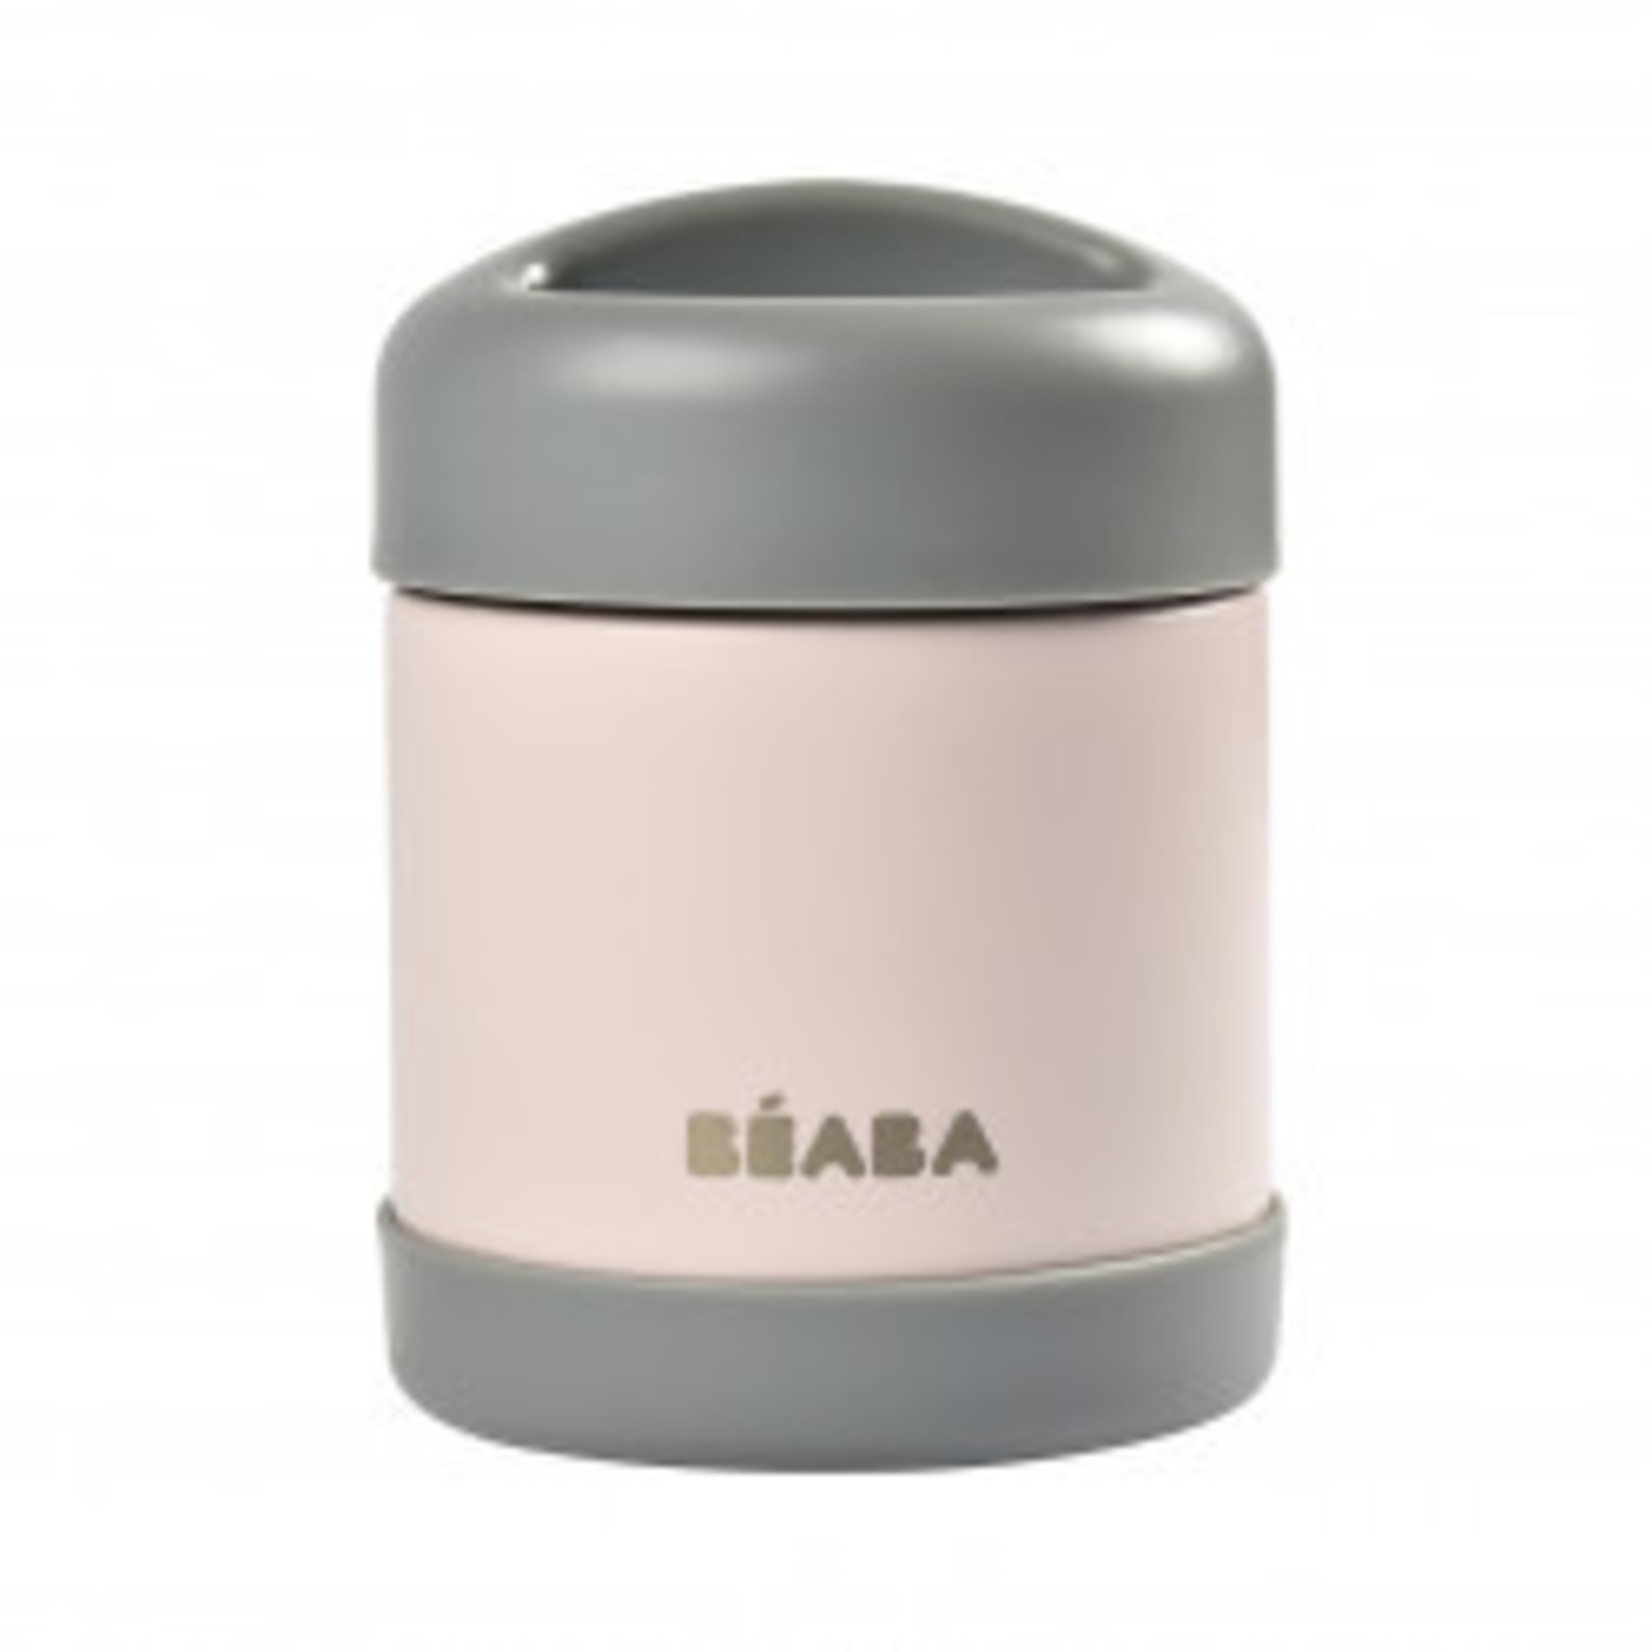 Beaba Beaba Foodjar 300ml Dark mist/ Light pink